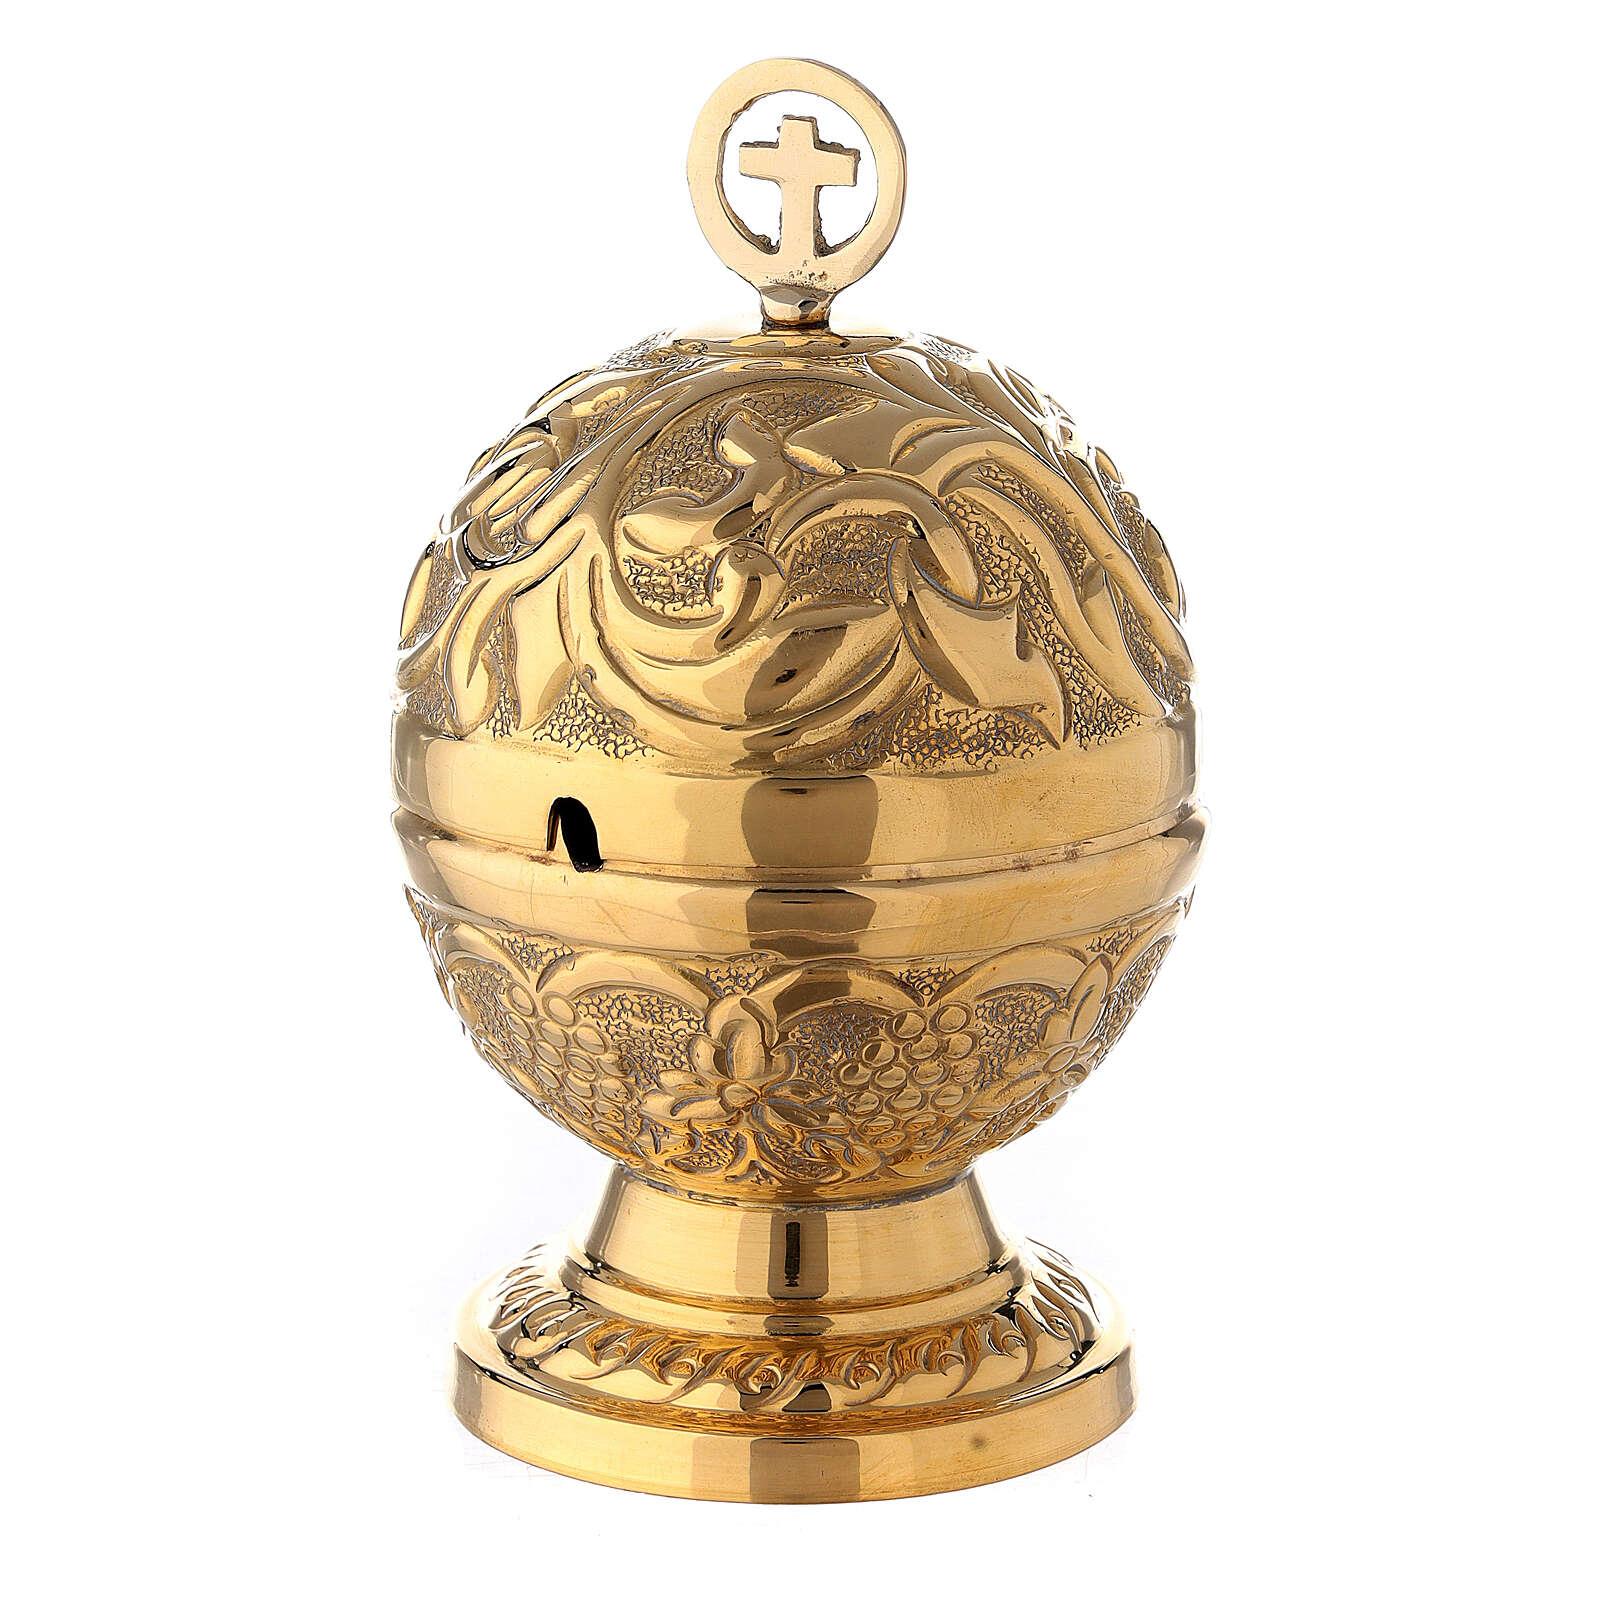 Naveta esférica barroca latón dorado 13 cm 3